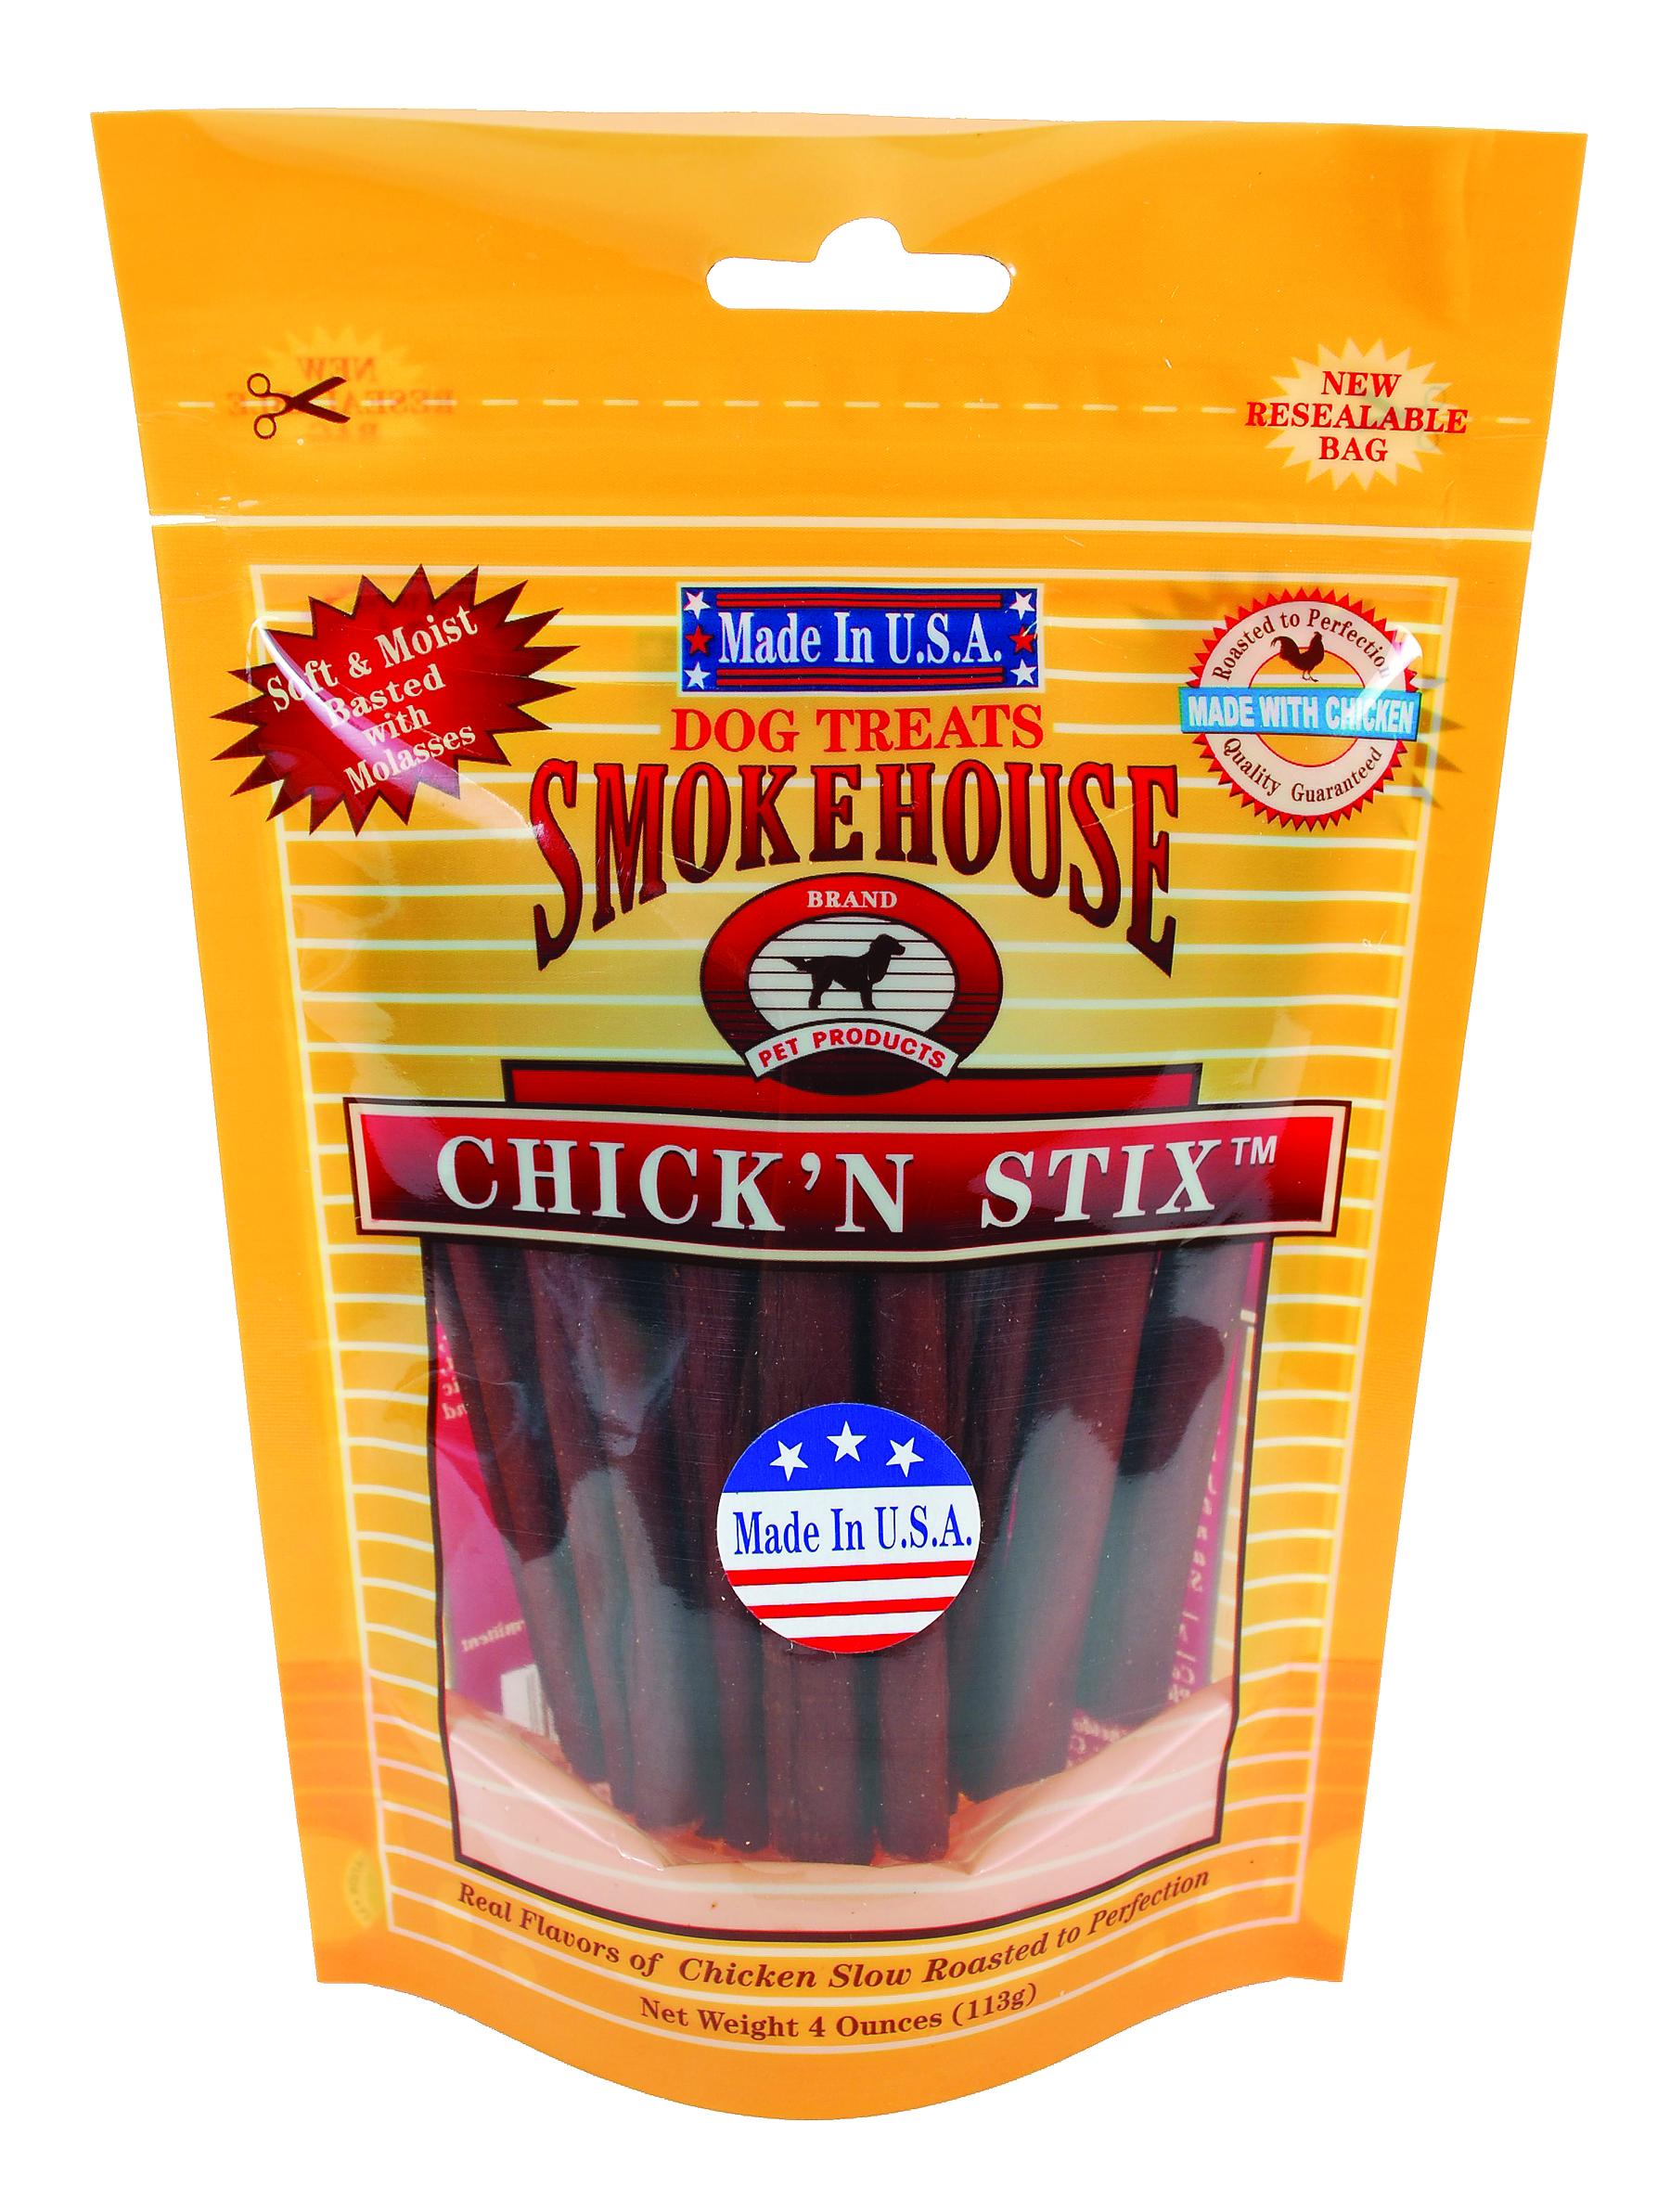 Smokehouse Chicken Stix